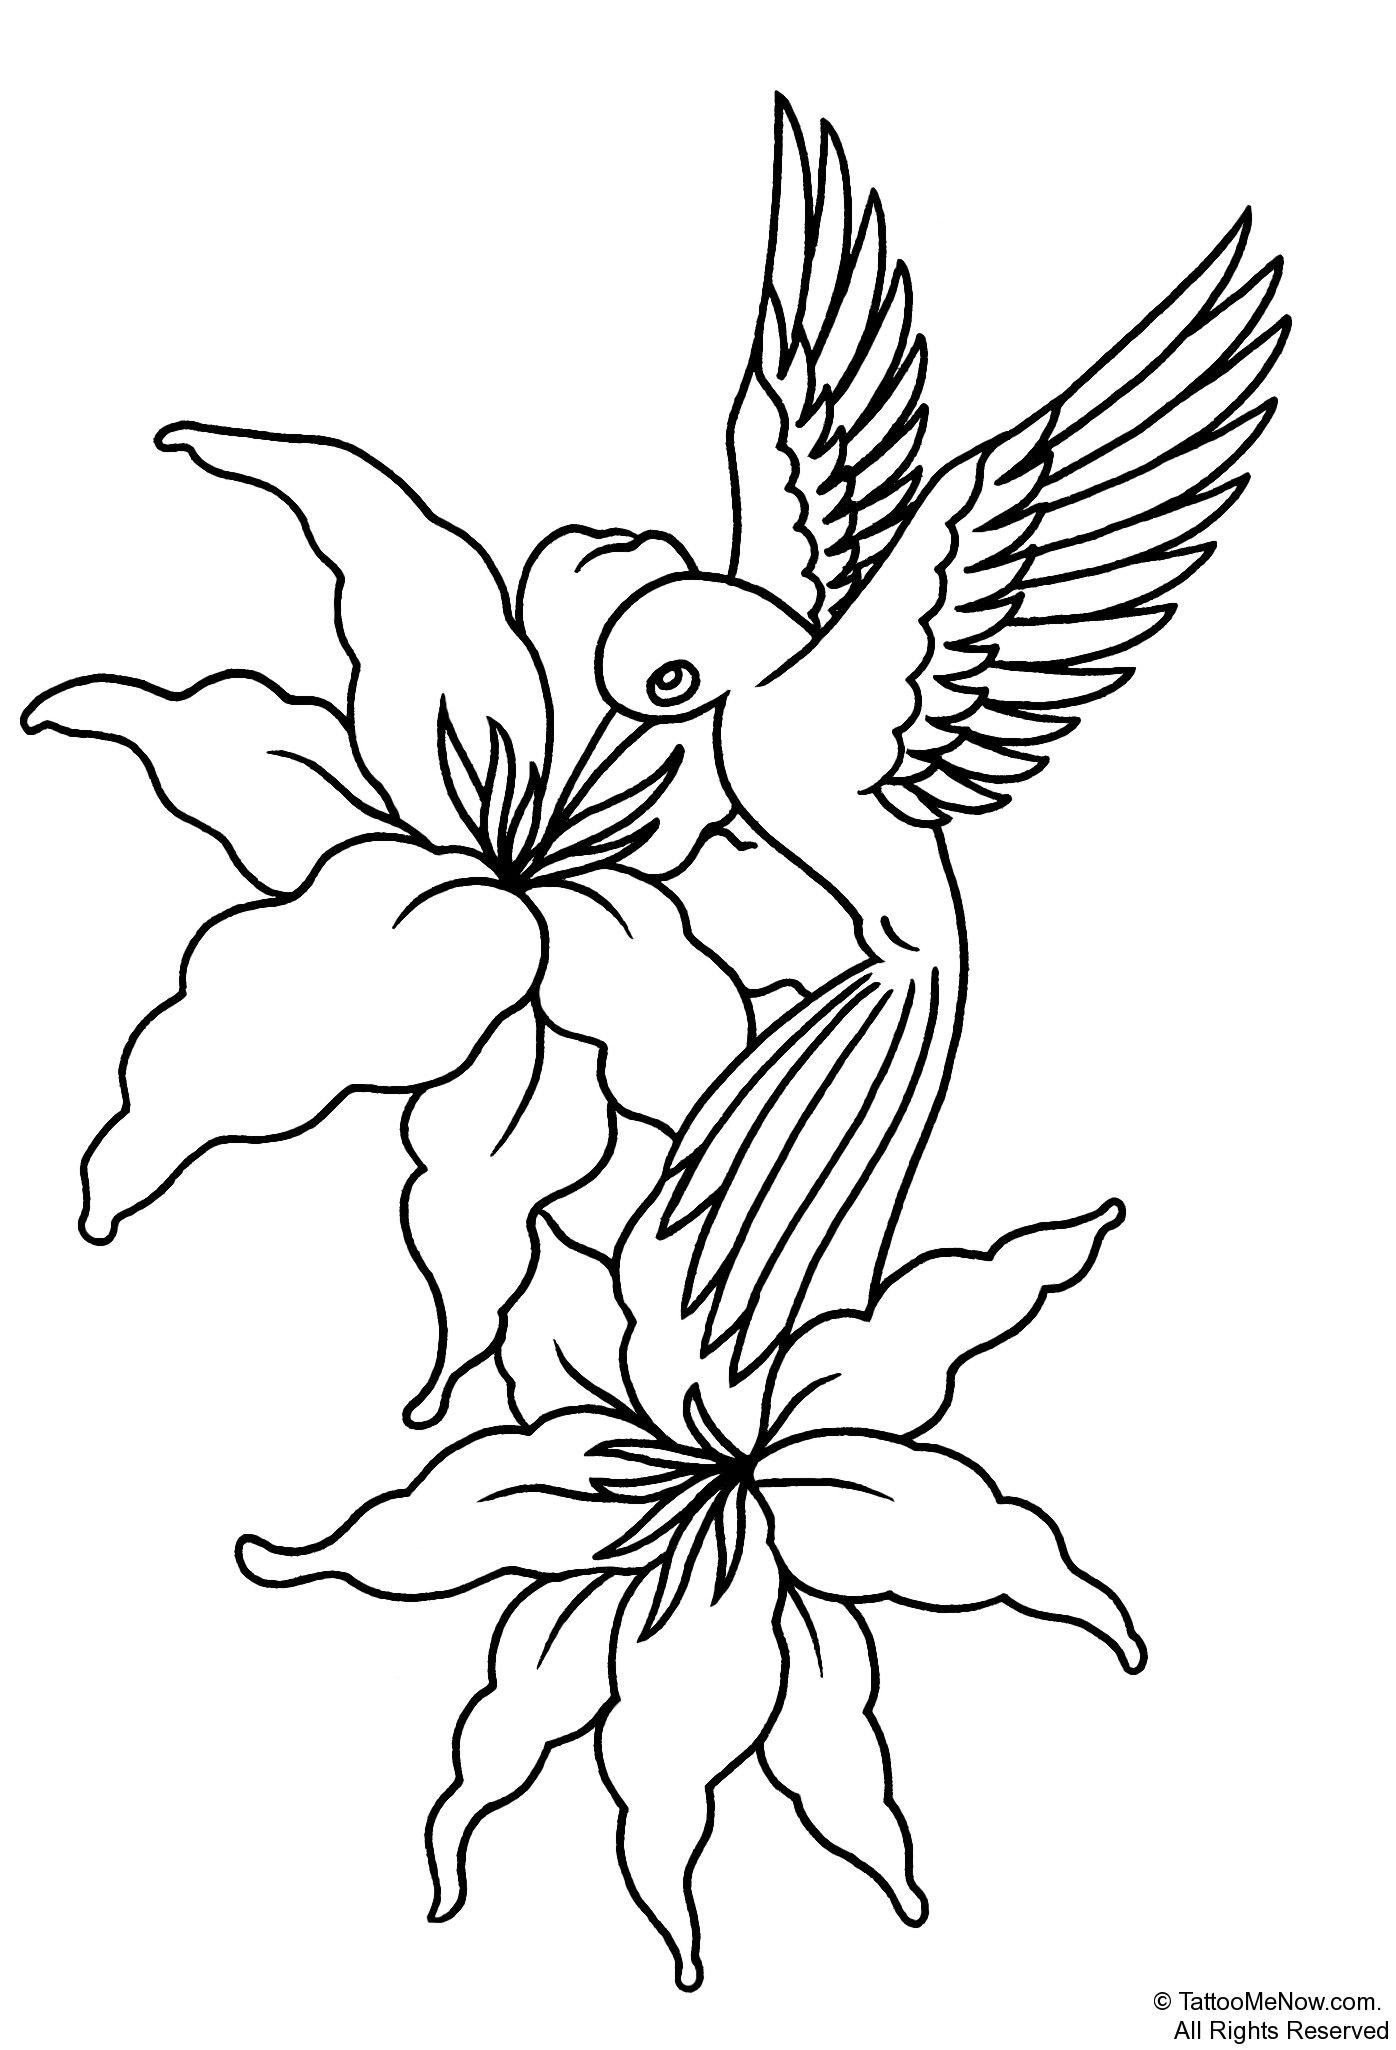 Free Printable Tattoo Stencils   Your Free Tattoo Designs & Stencils - Free Printable Tattoo Designs